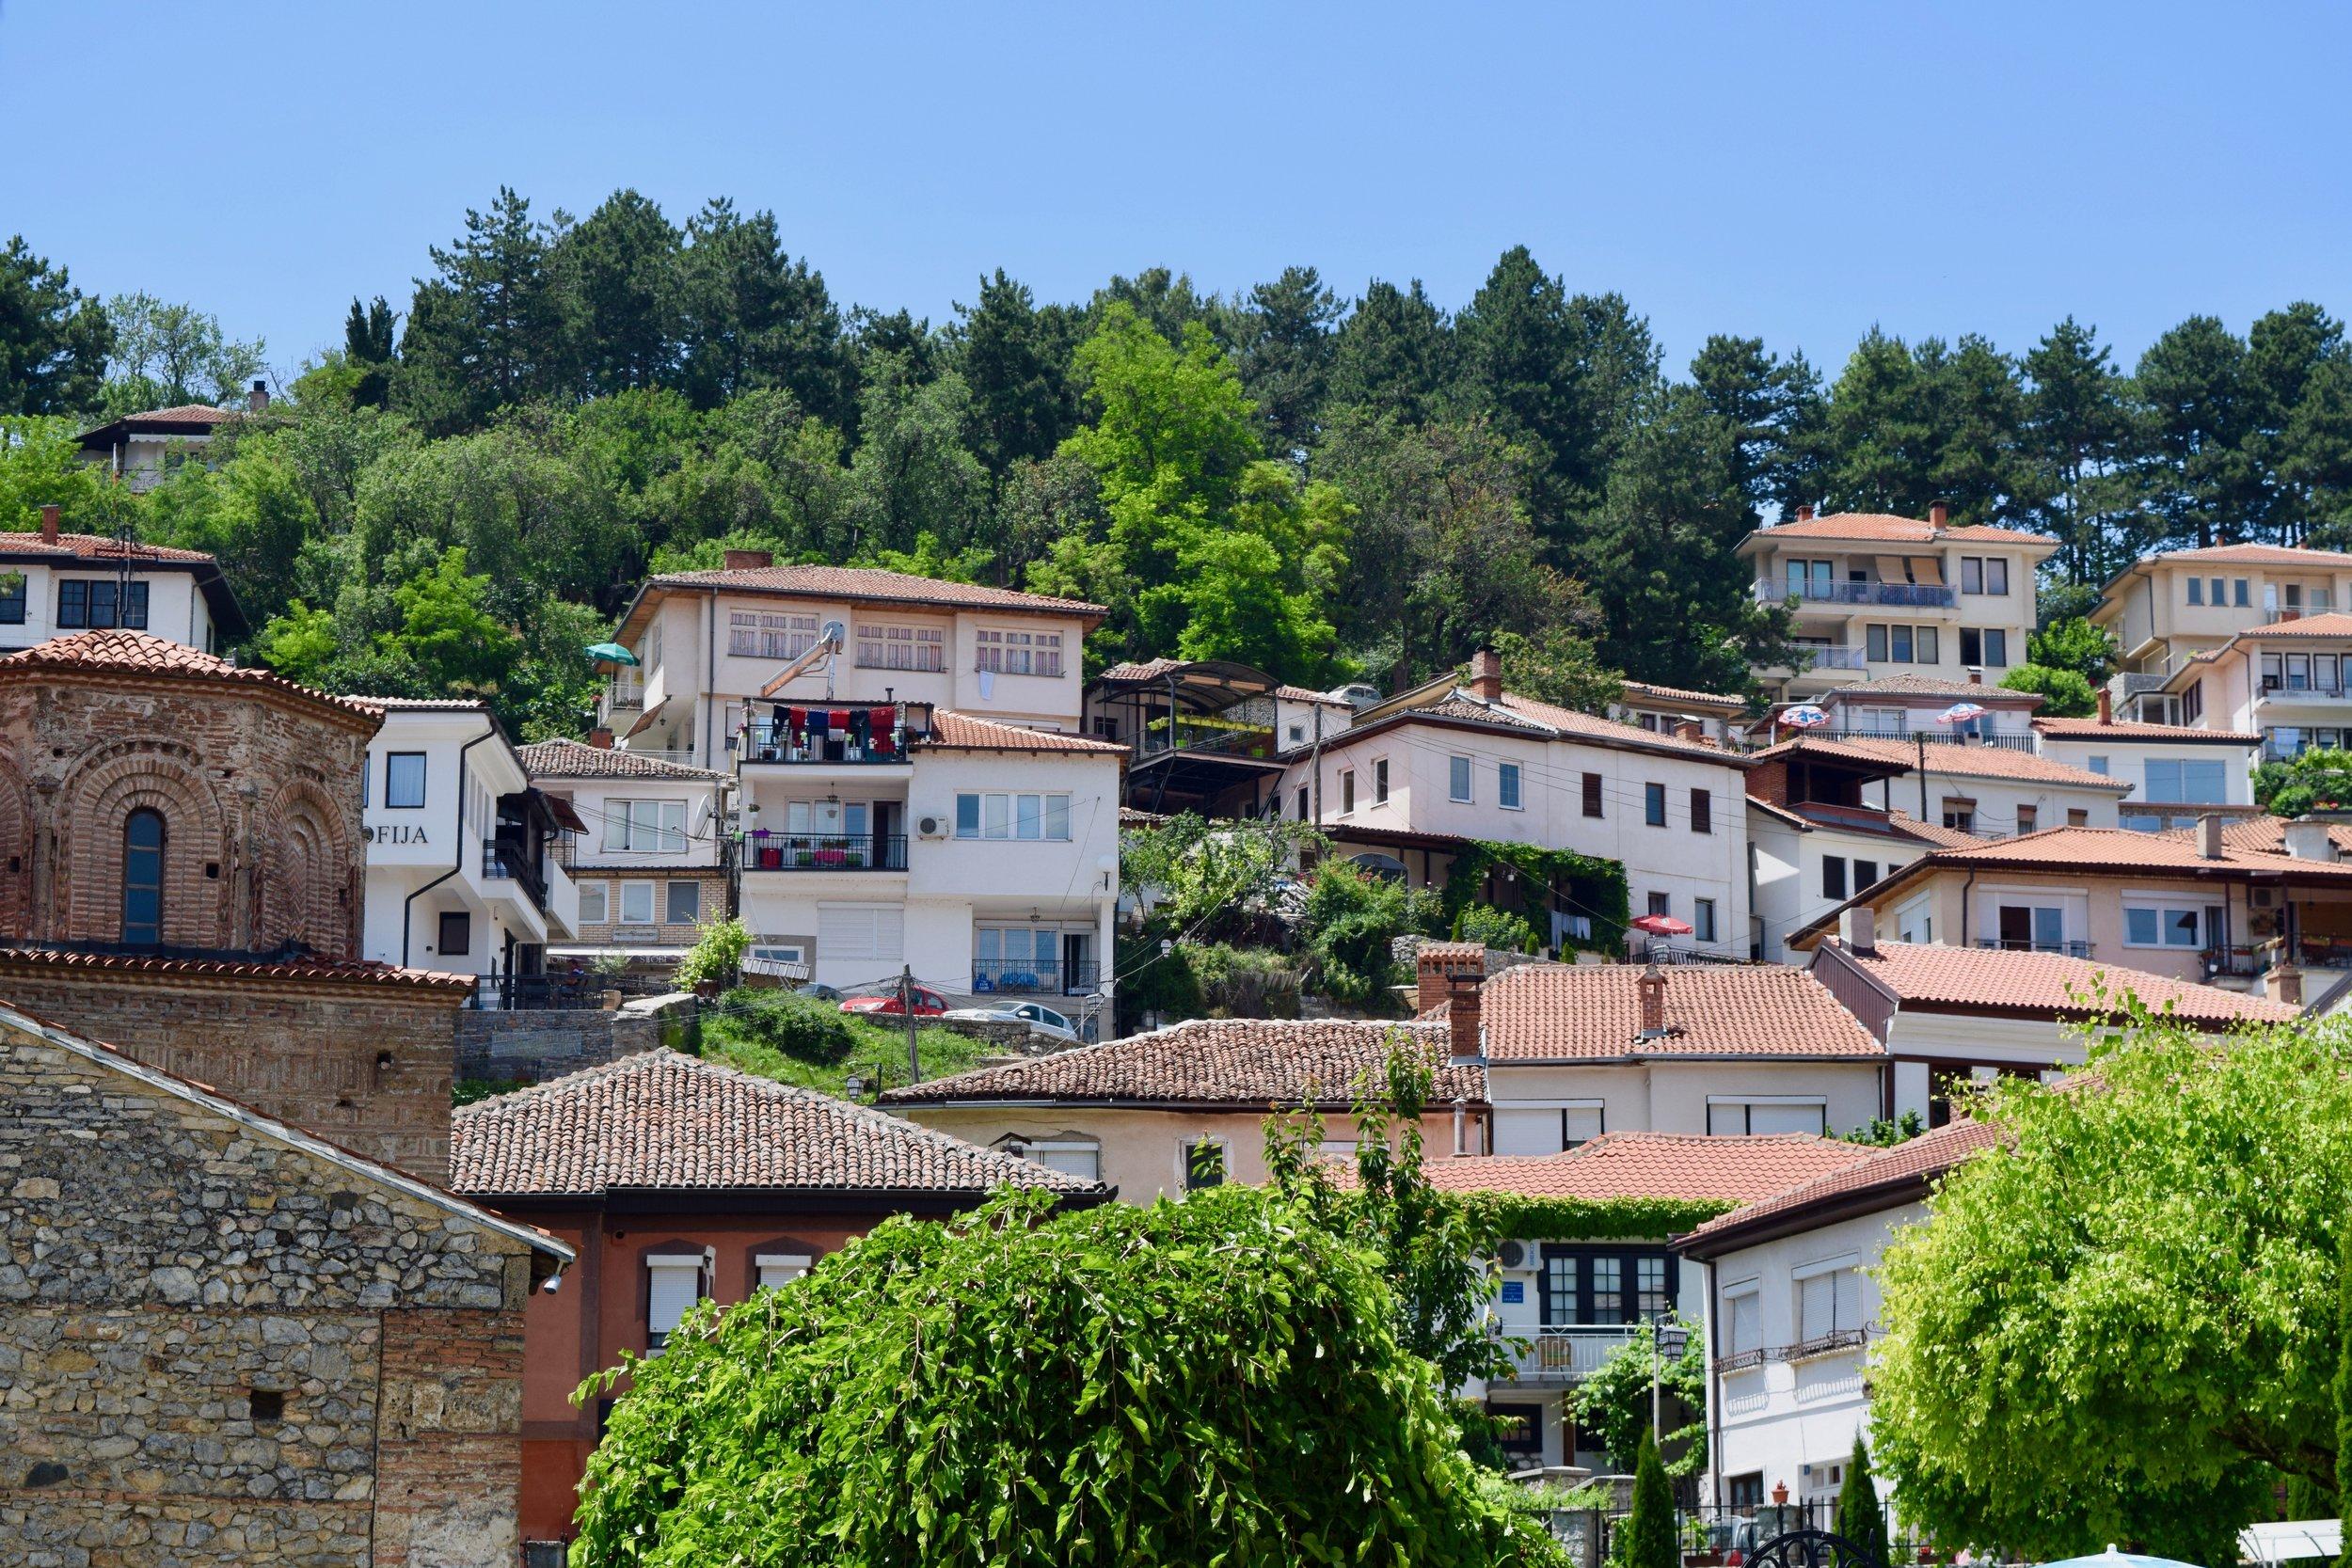 Houses in Ohrid